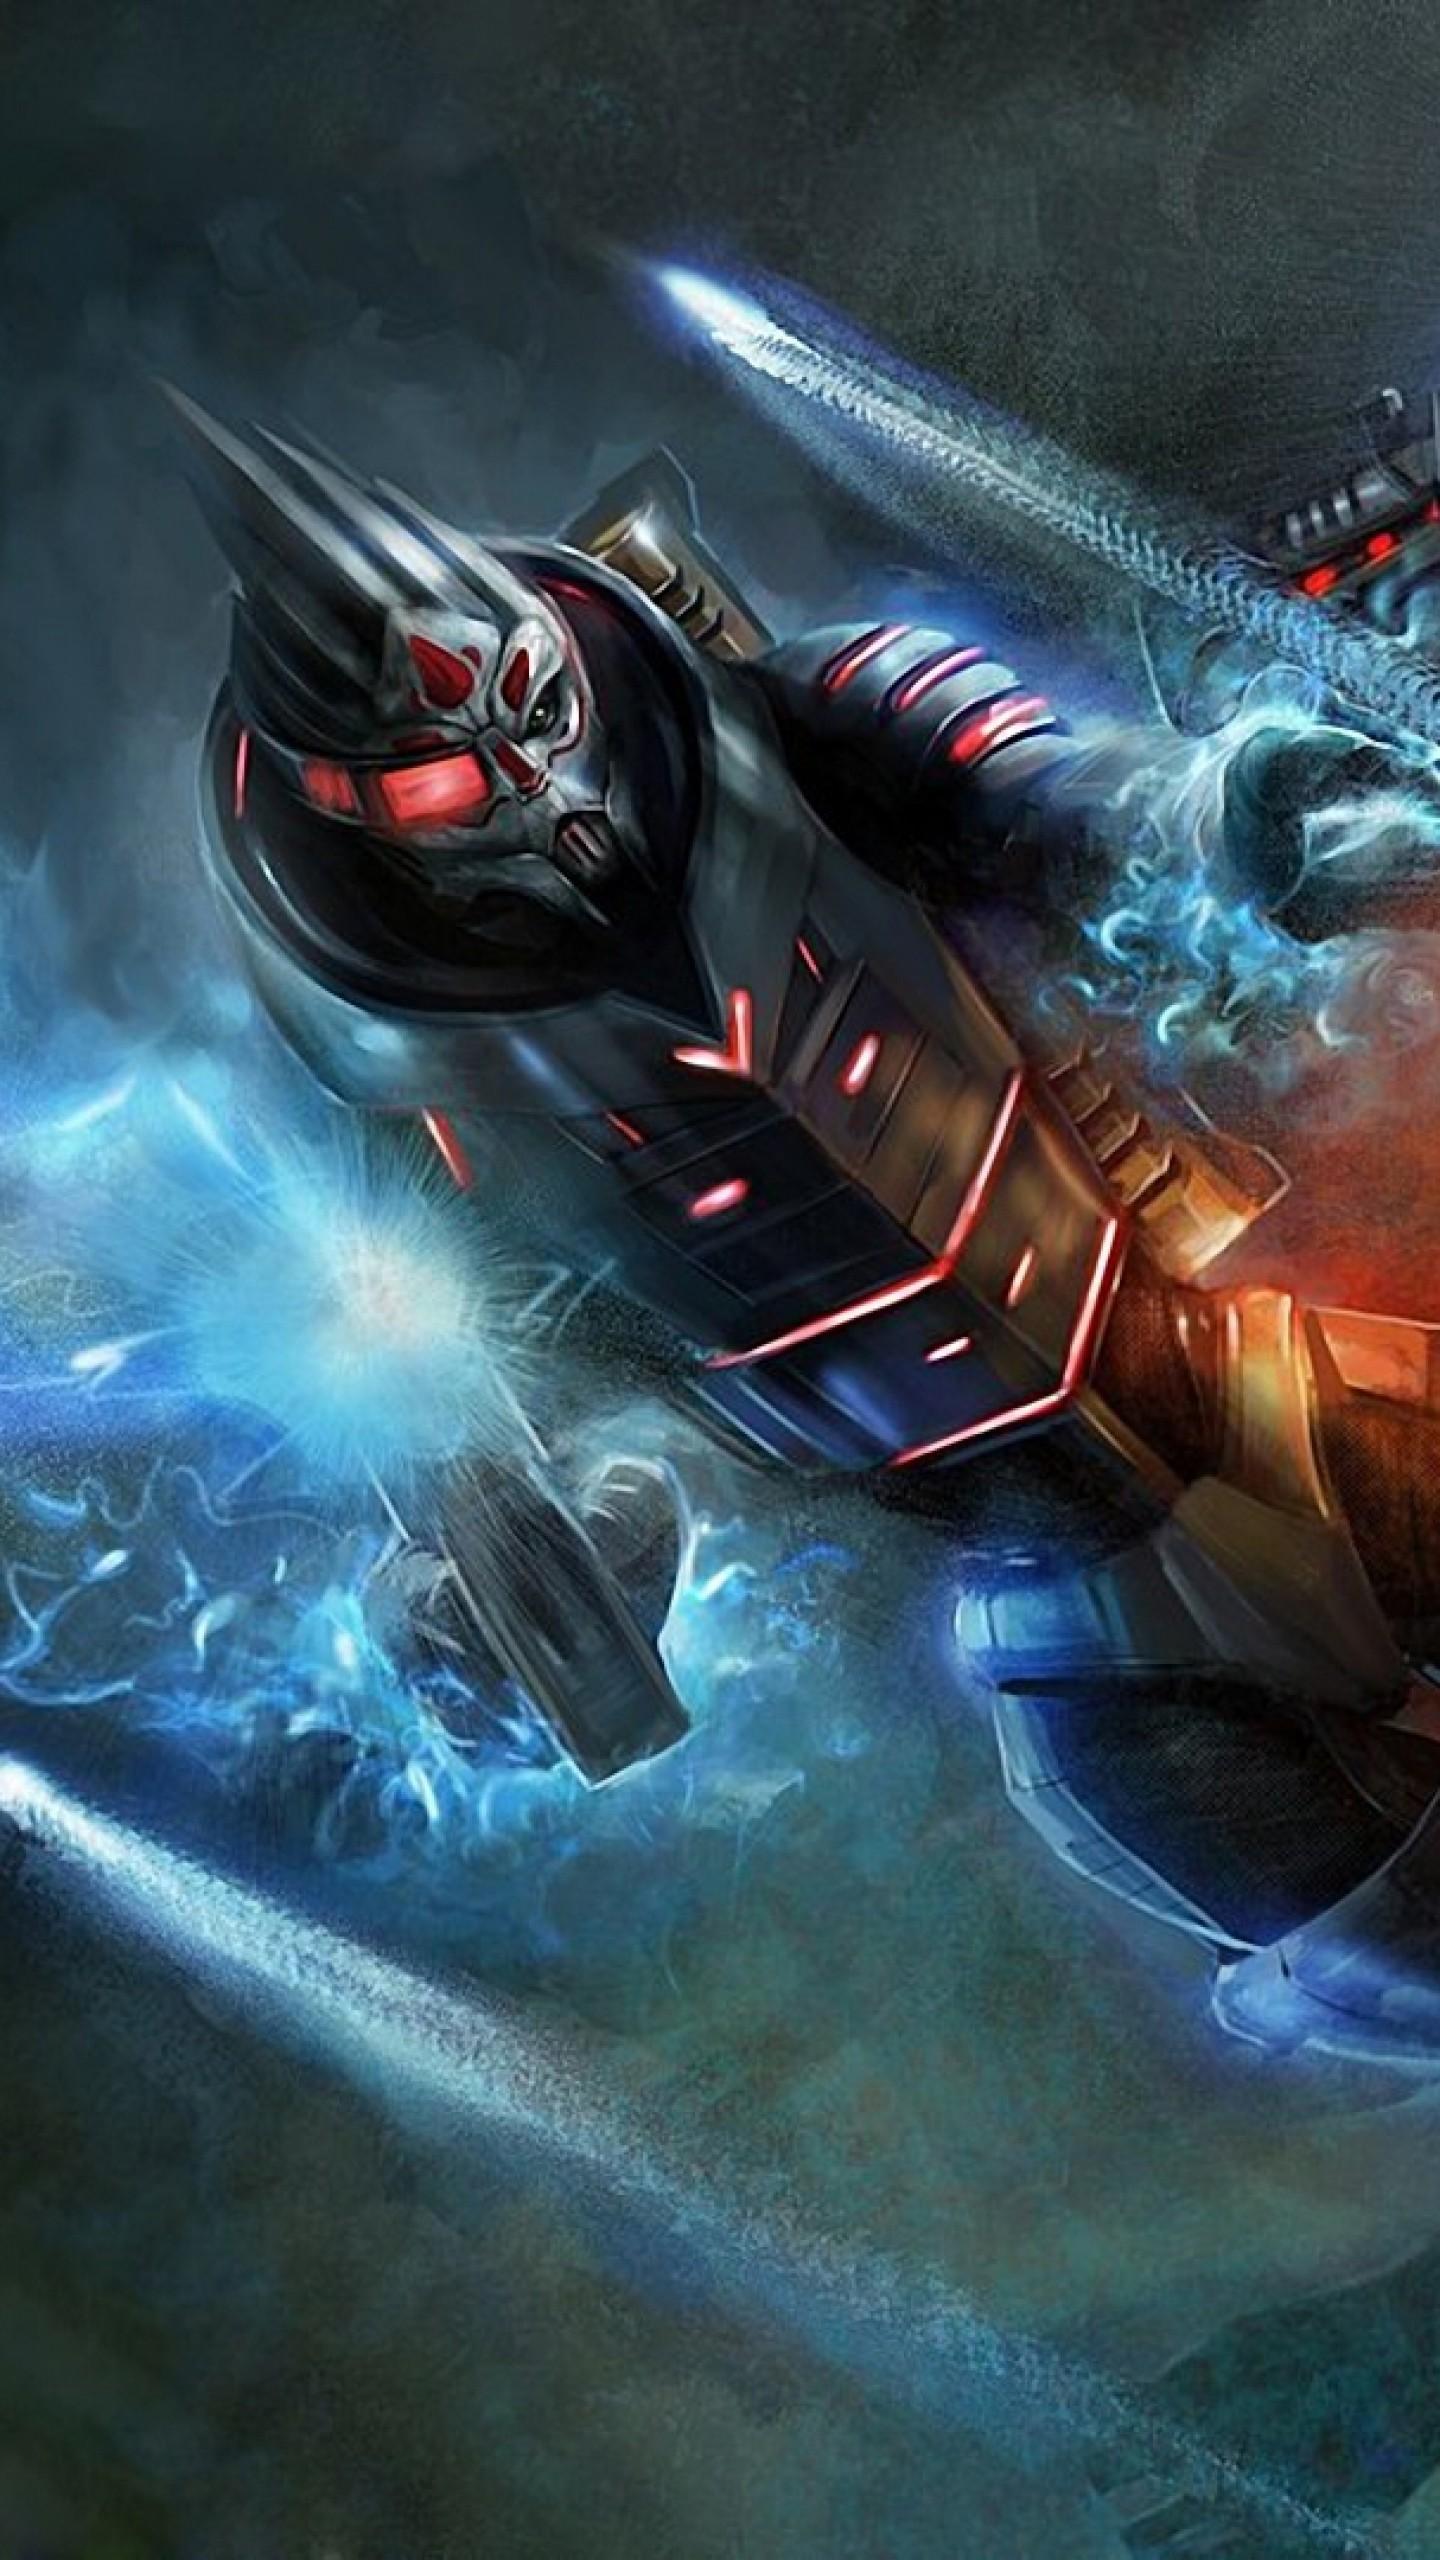 Mass Effect Andromeda Wallpaper Iphone Mass Effect Andromeda